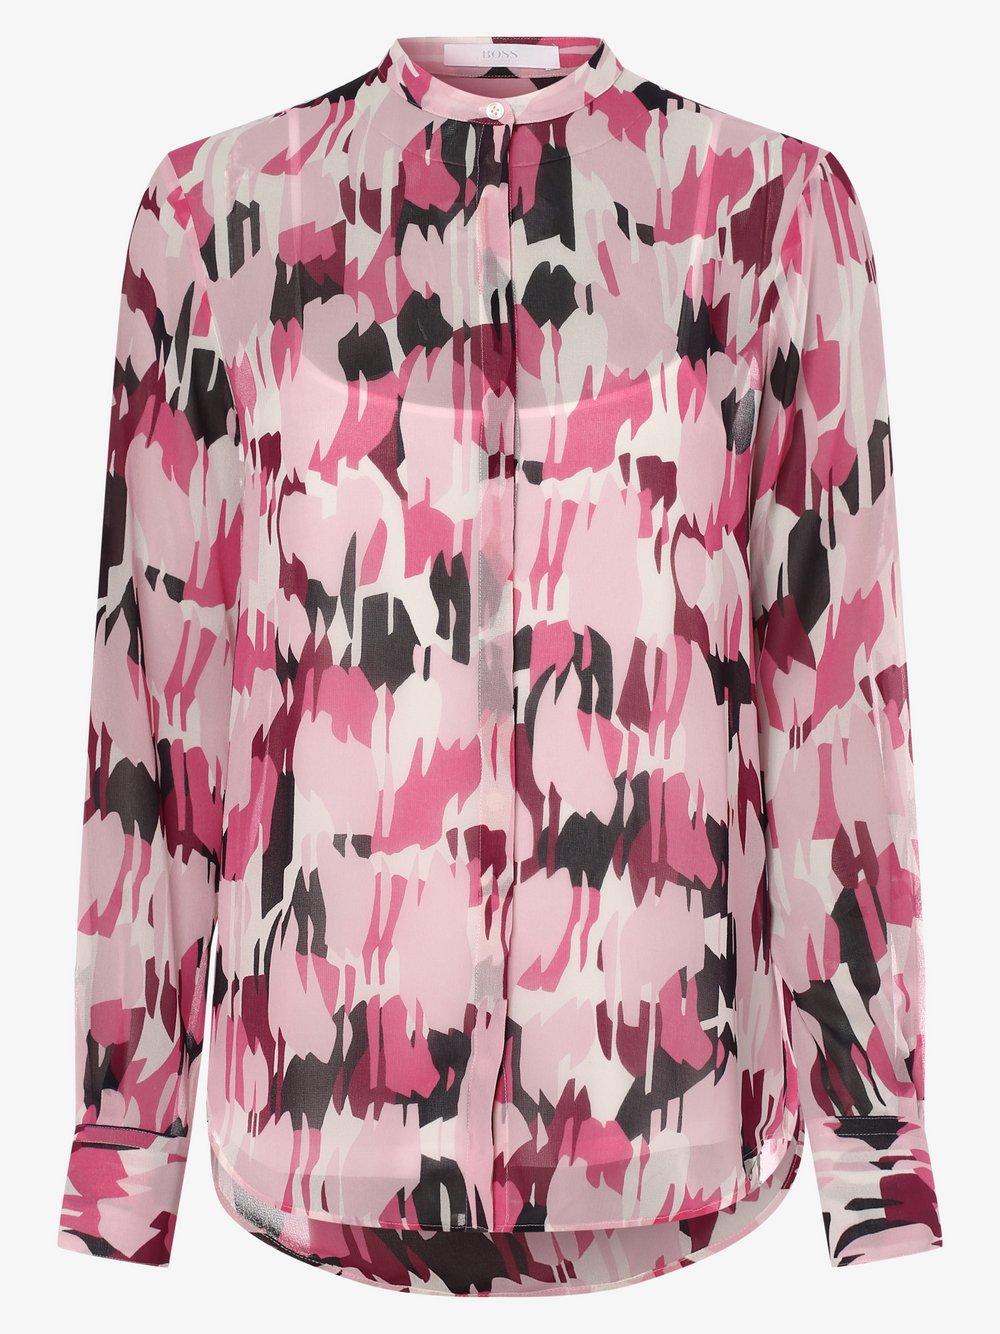 BOSS Casual – Bluzka damska – Efelize_17, różowy Van Graaf 473057-0001-00340